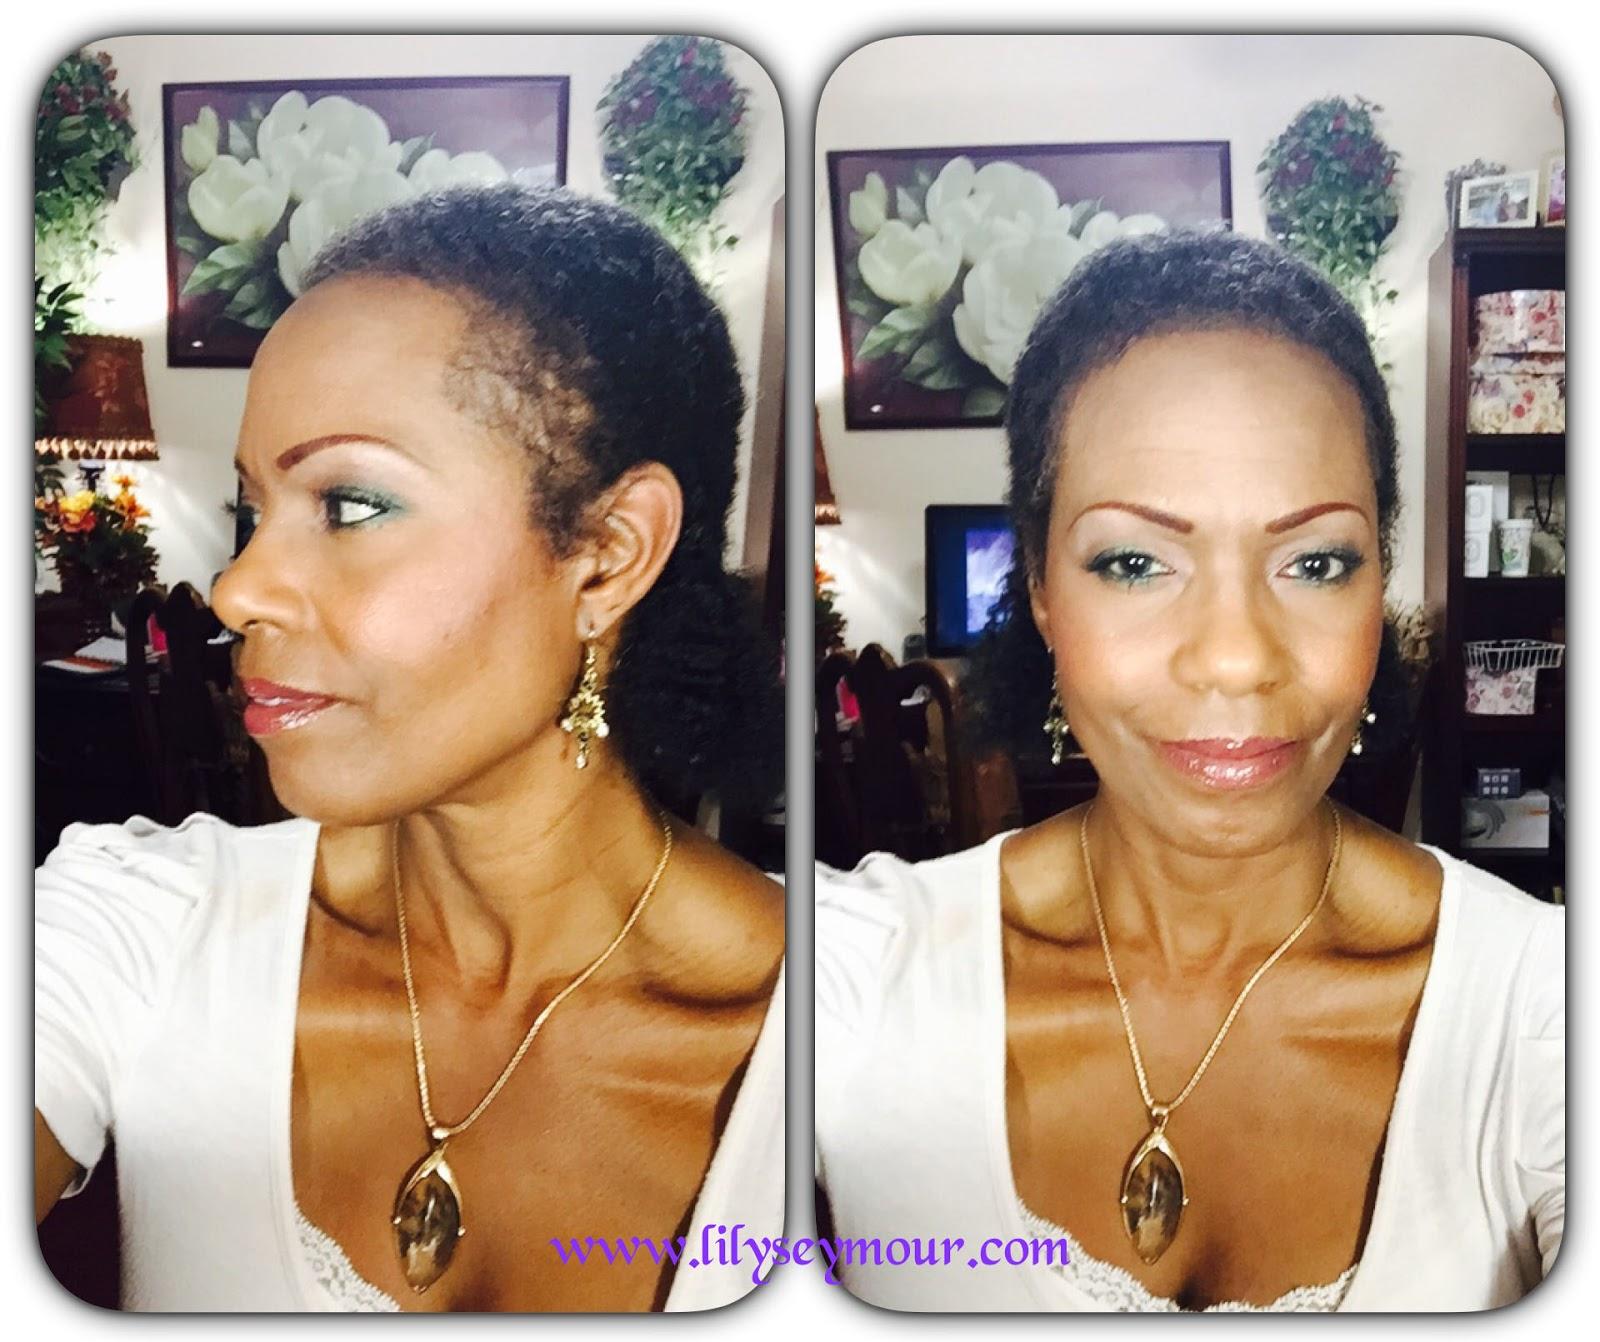 mature   over 50 Beauty Blogger   #womenofcolor #brownskin